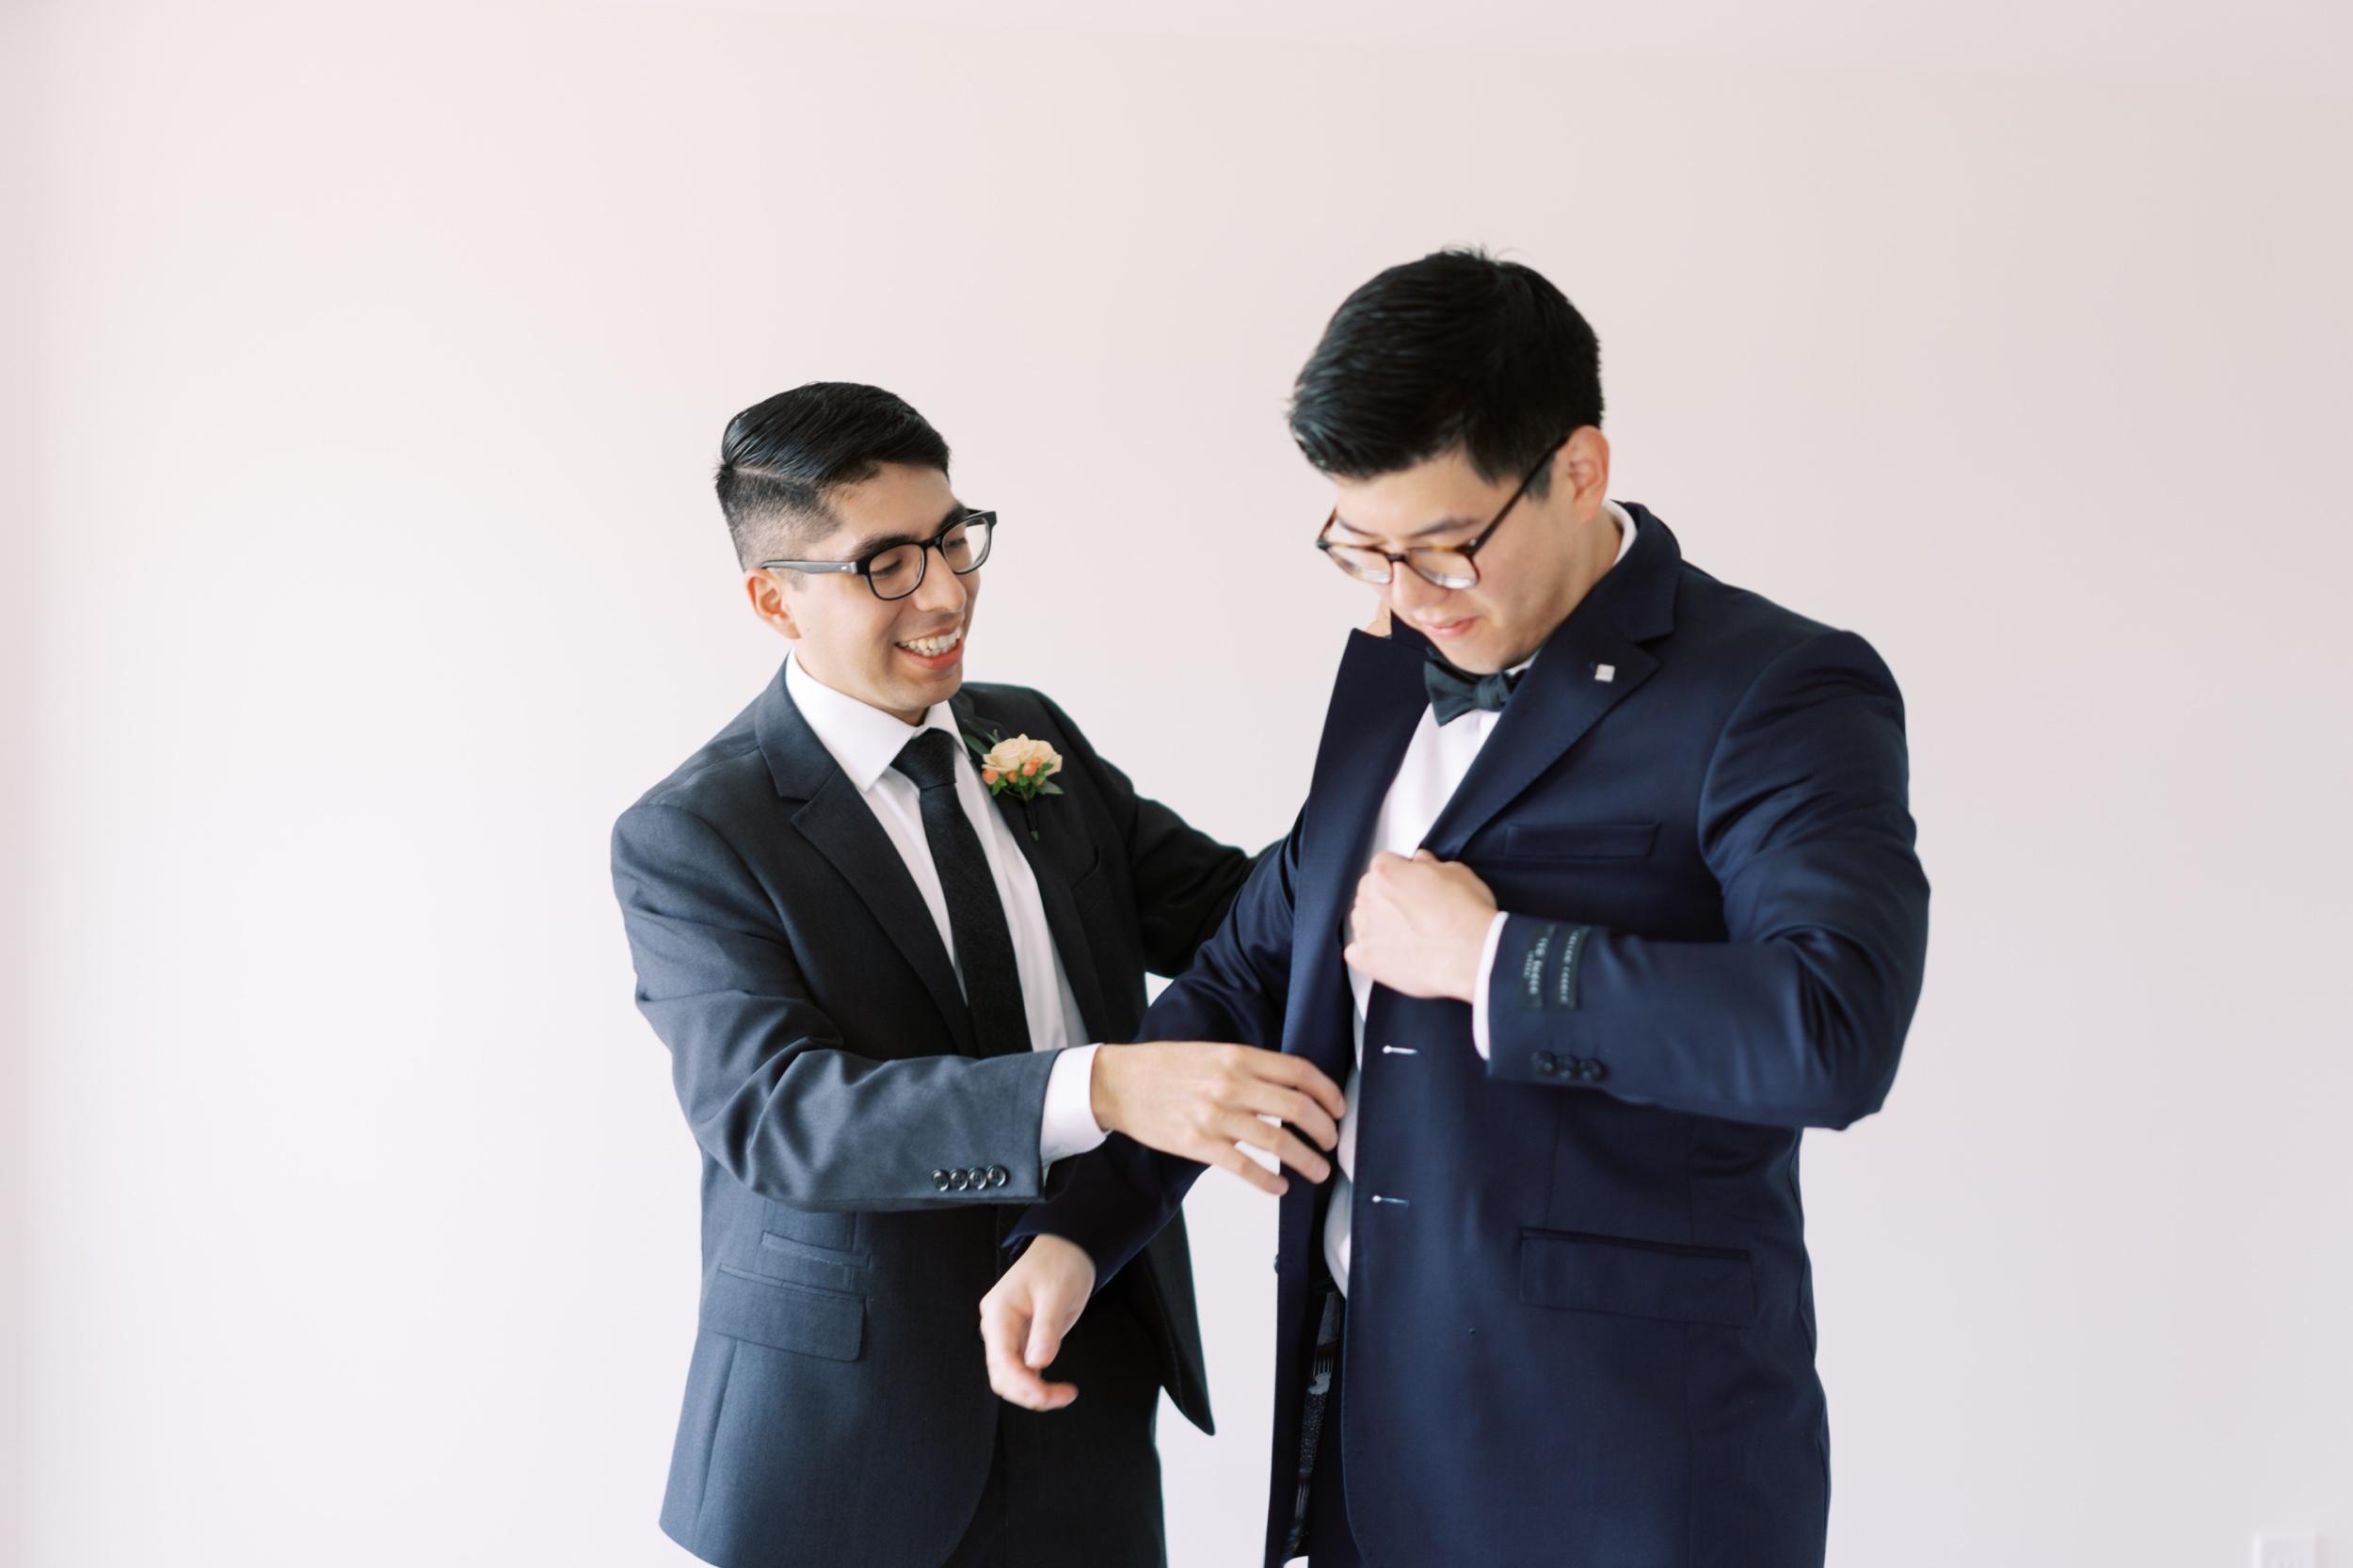 arlington estate wedding - groom getting ready-8.jpeg